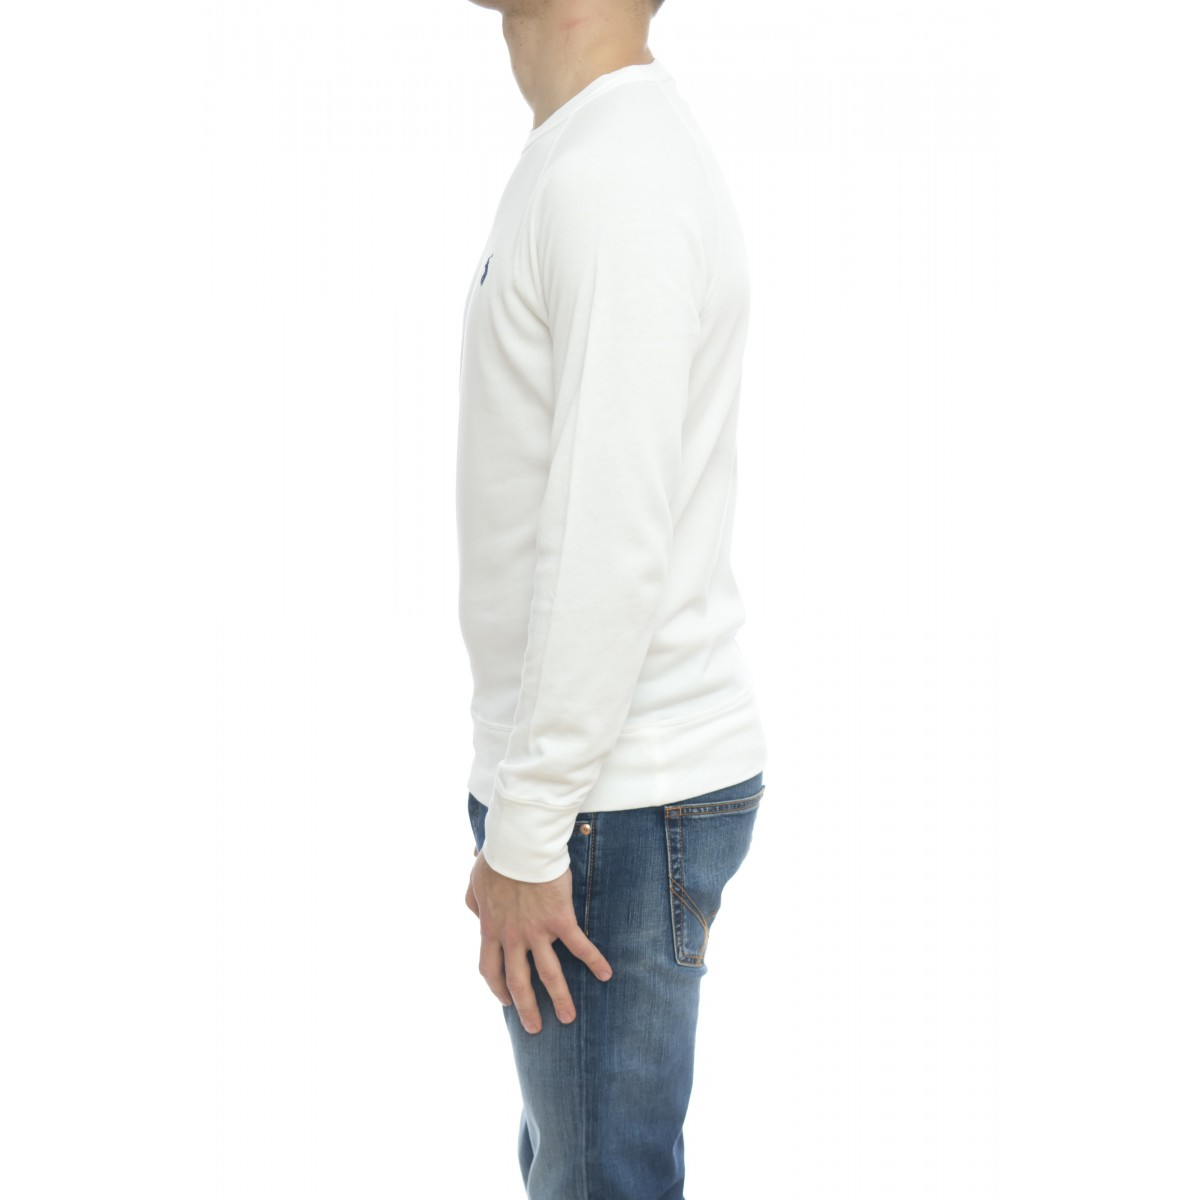 Felpa uomo - 644952 felpa girocollo leggera